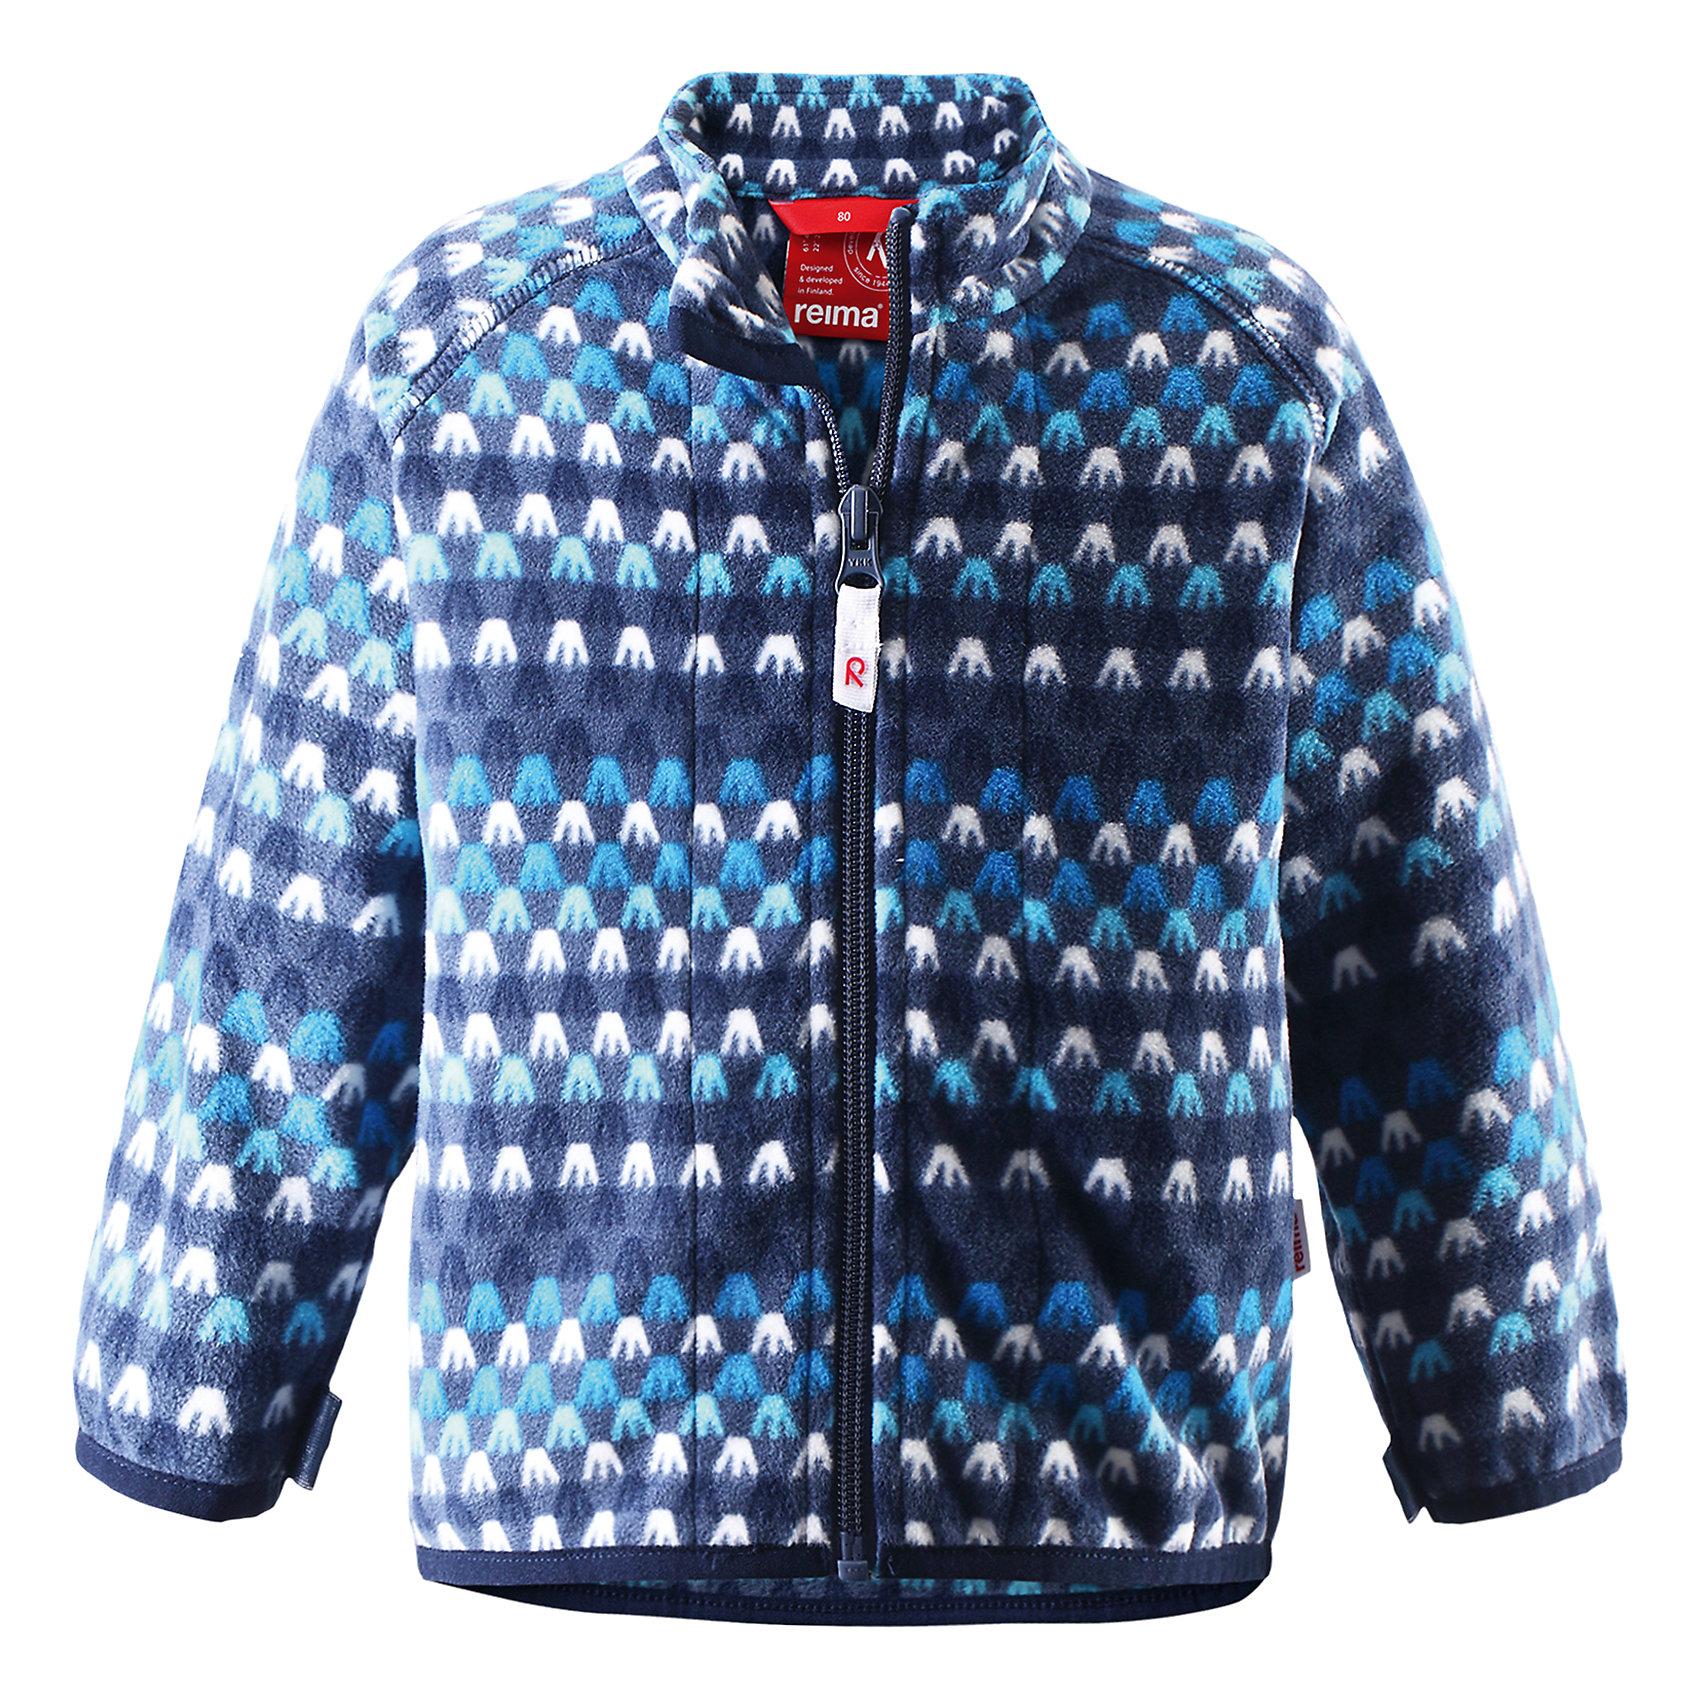 Reima Куртка флисовая Vemmel Reima reima куртка флисовая steppe reima